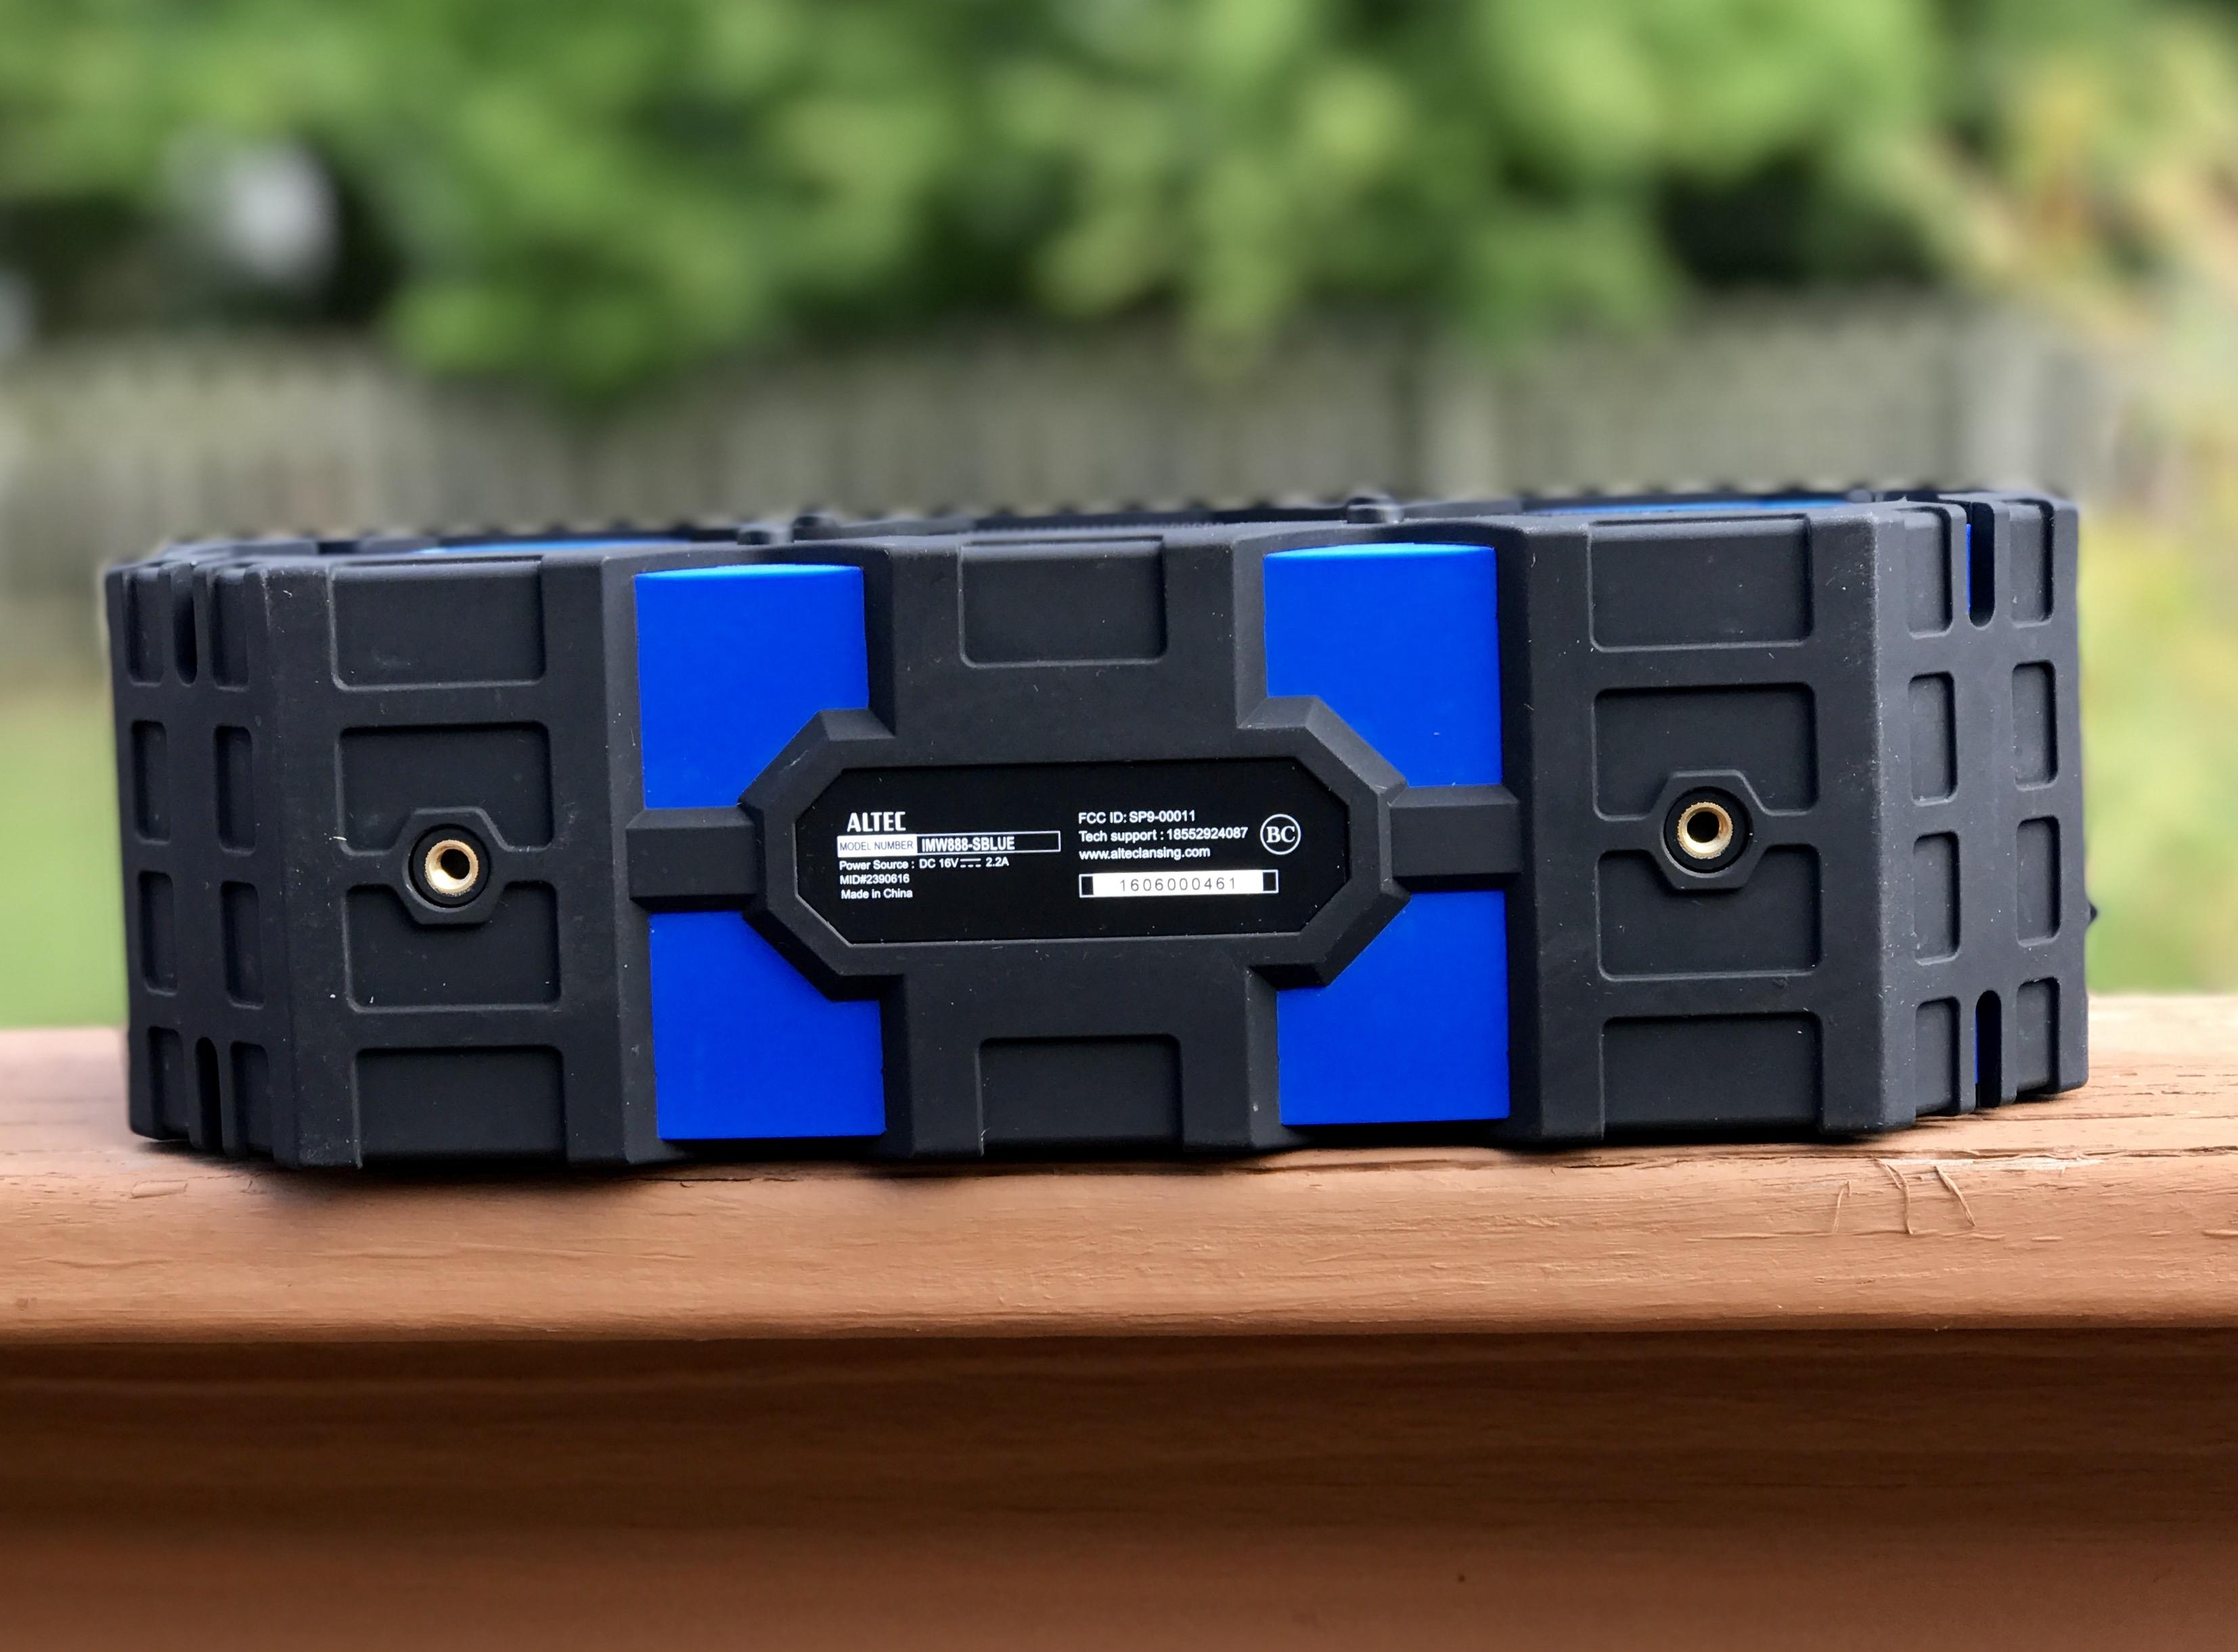 Super Life Jacket Imw888-sblue Portable Wireless Speaker Altec Lansing blue Latest Technology